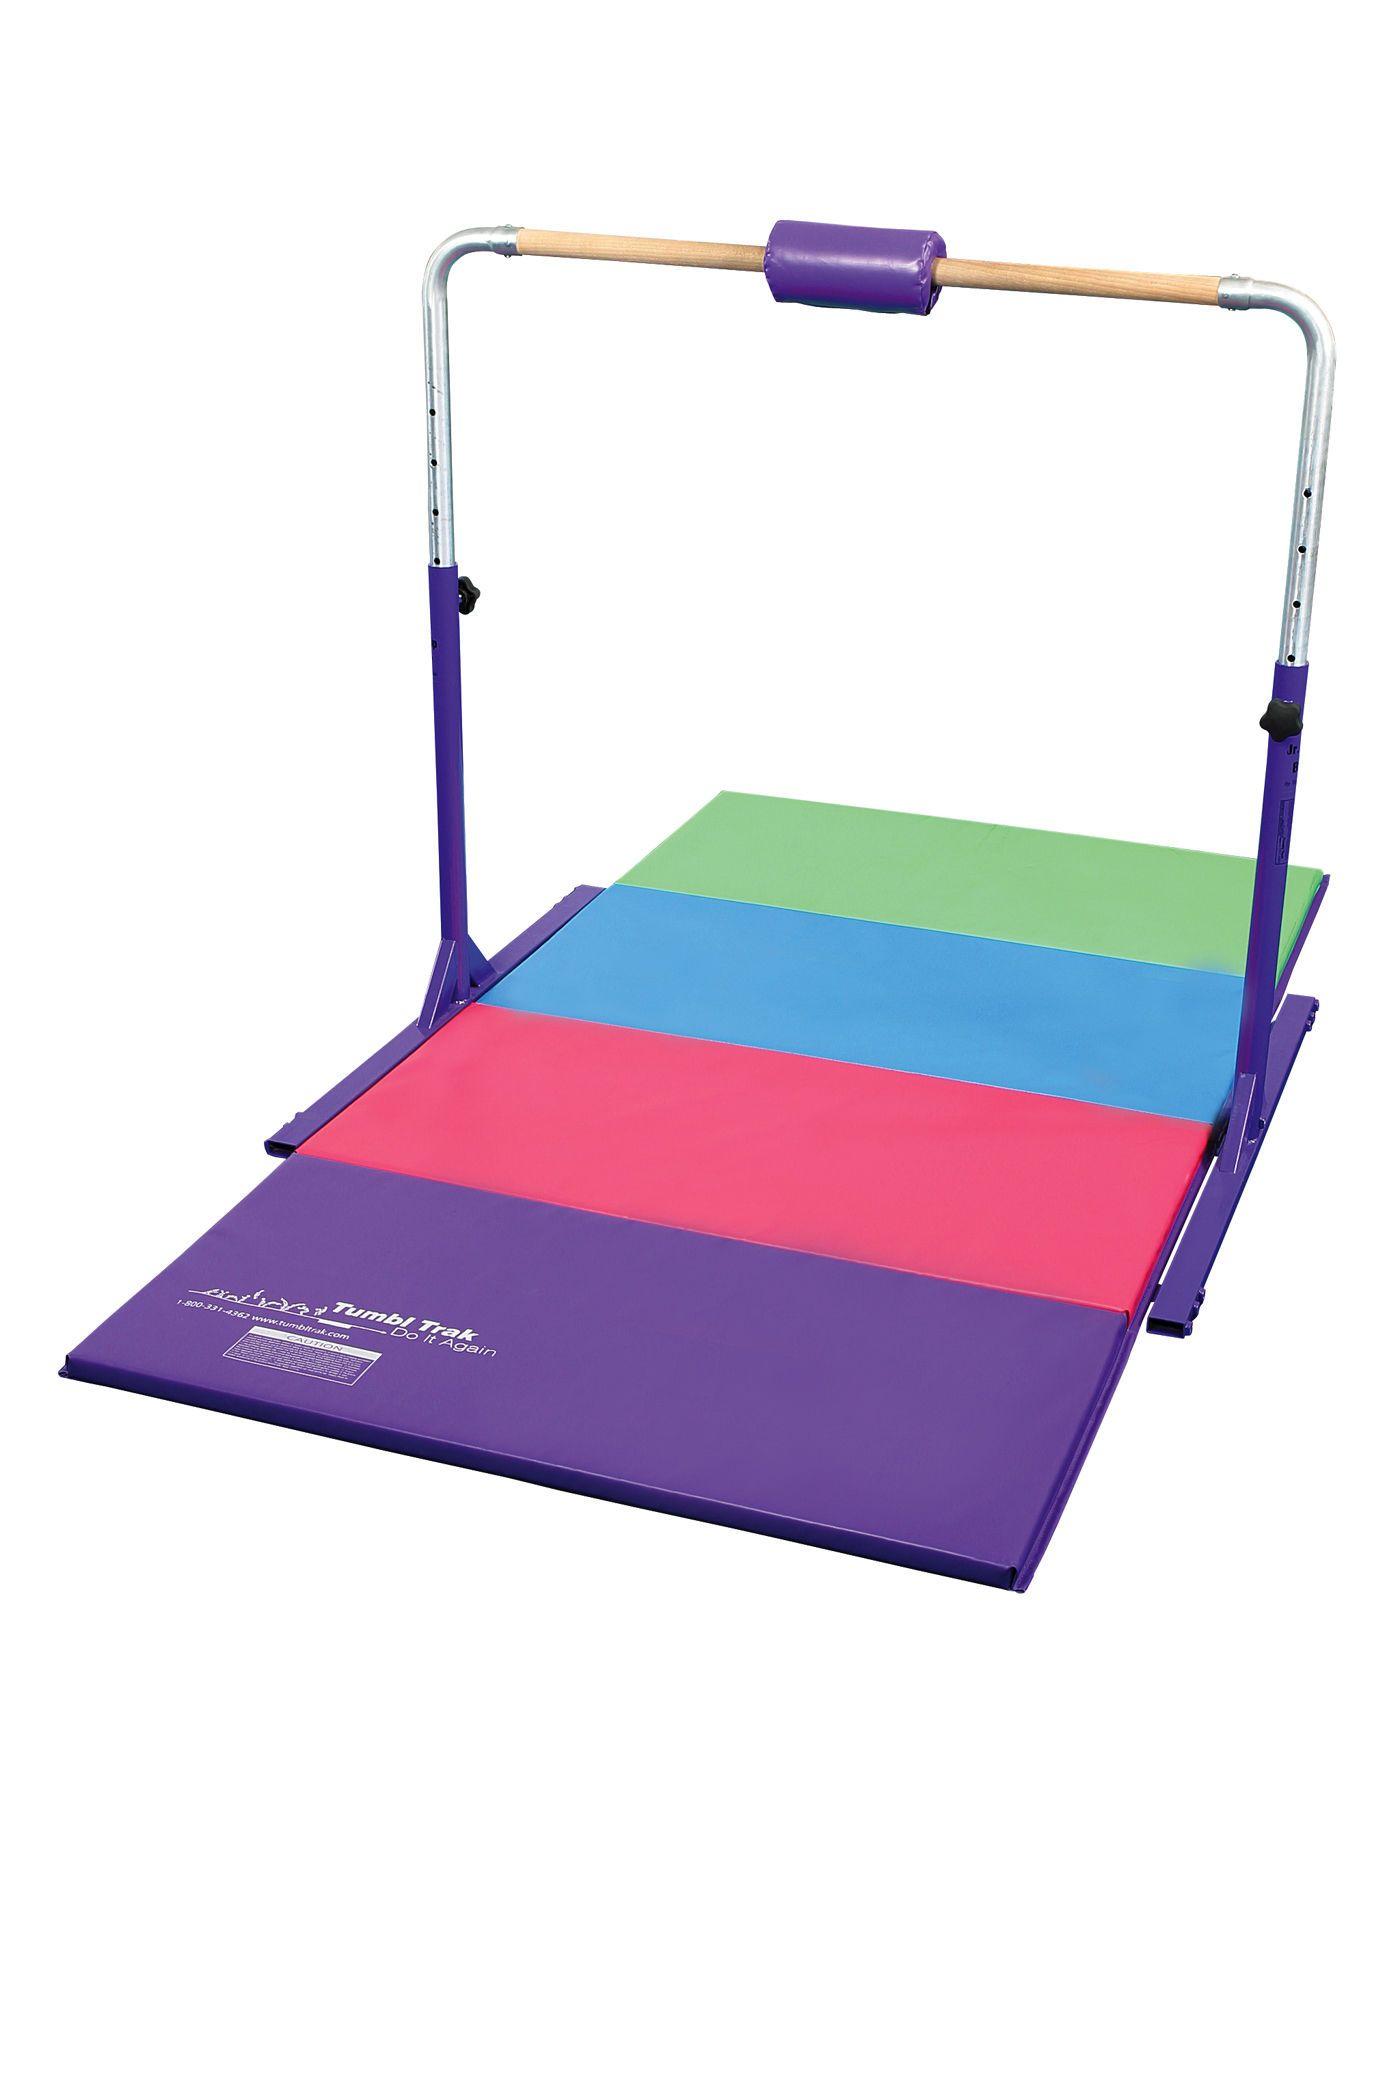 Gymnastics On Pinterest Gymnastics Bars Gymnastics And